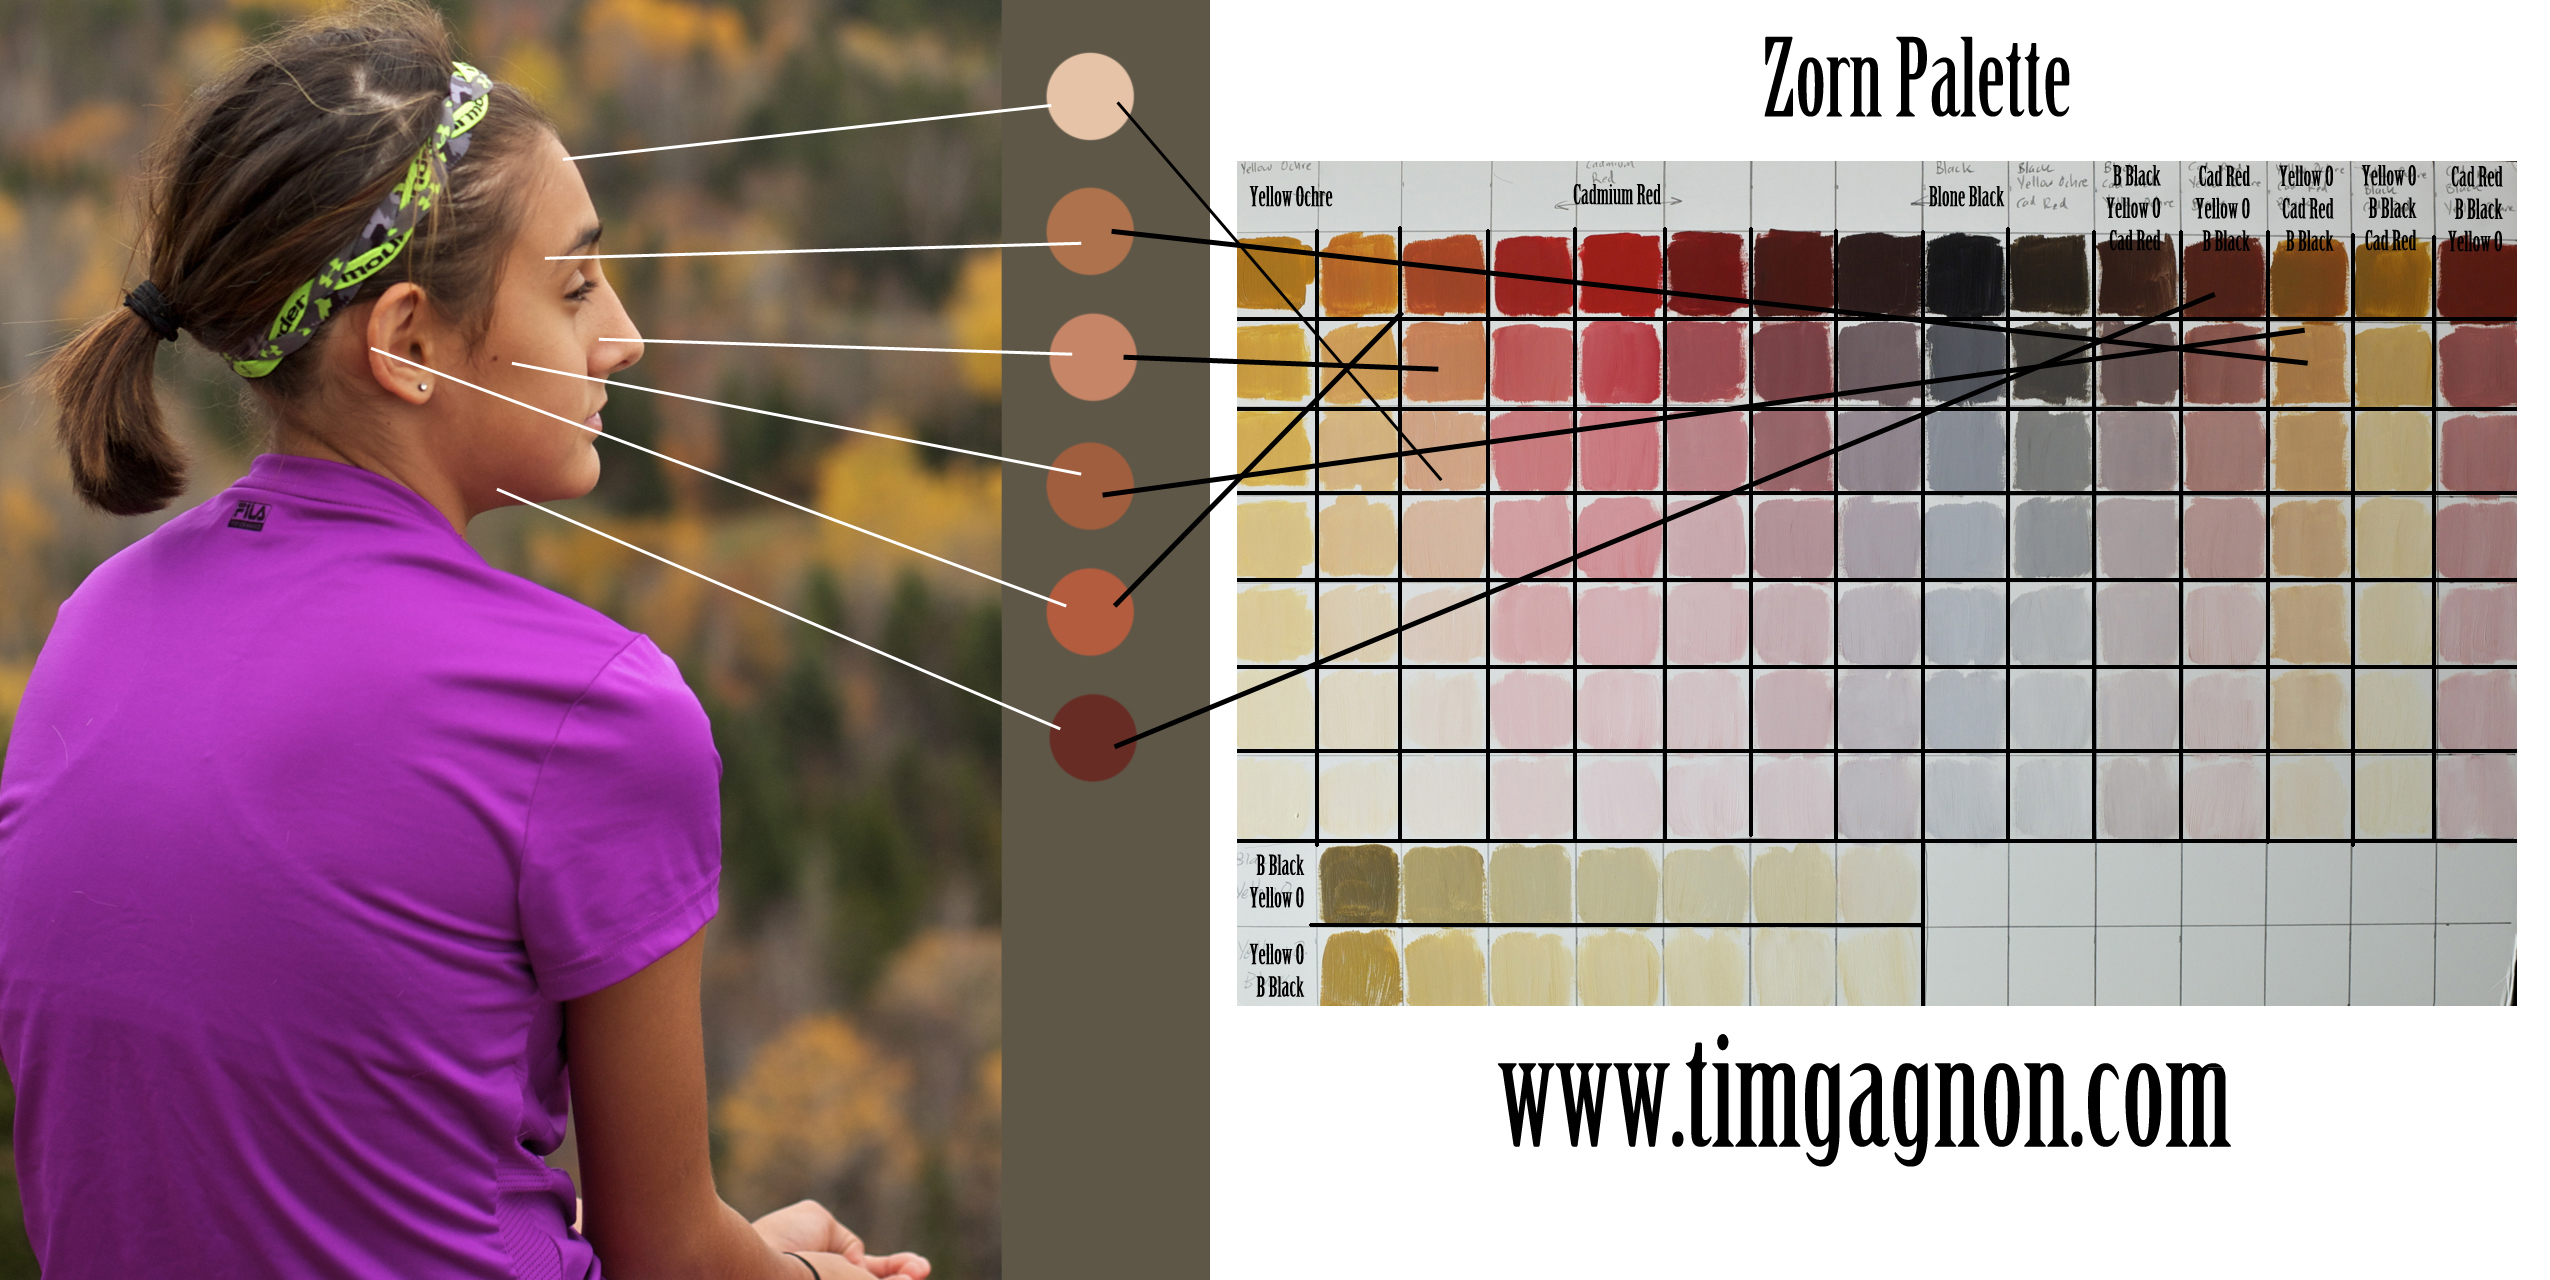 Making The Color Palette For Skin Tones A Bit Easier